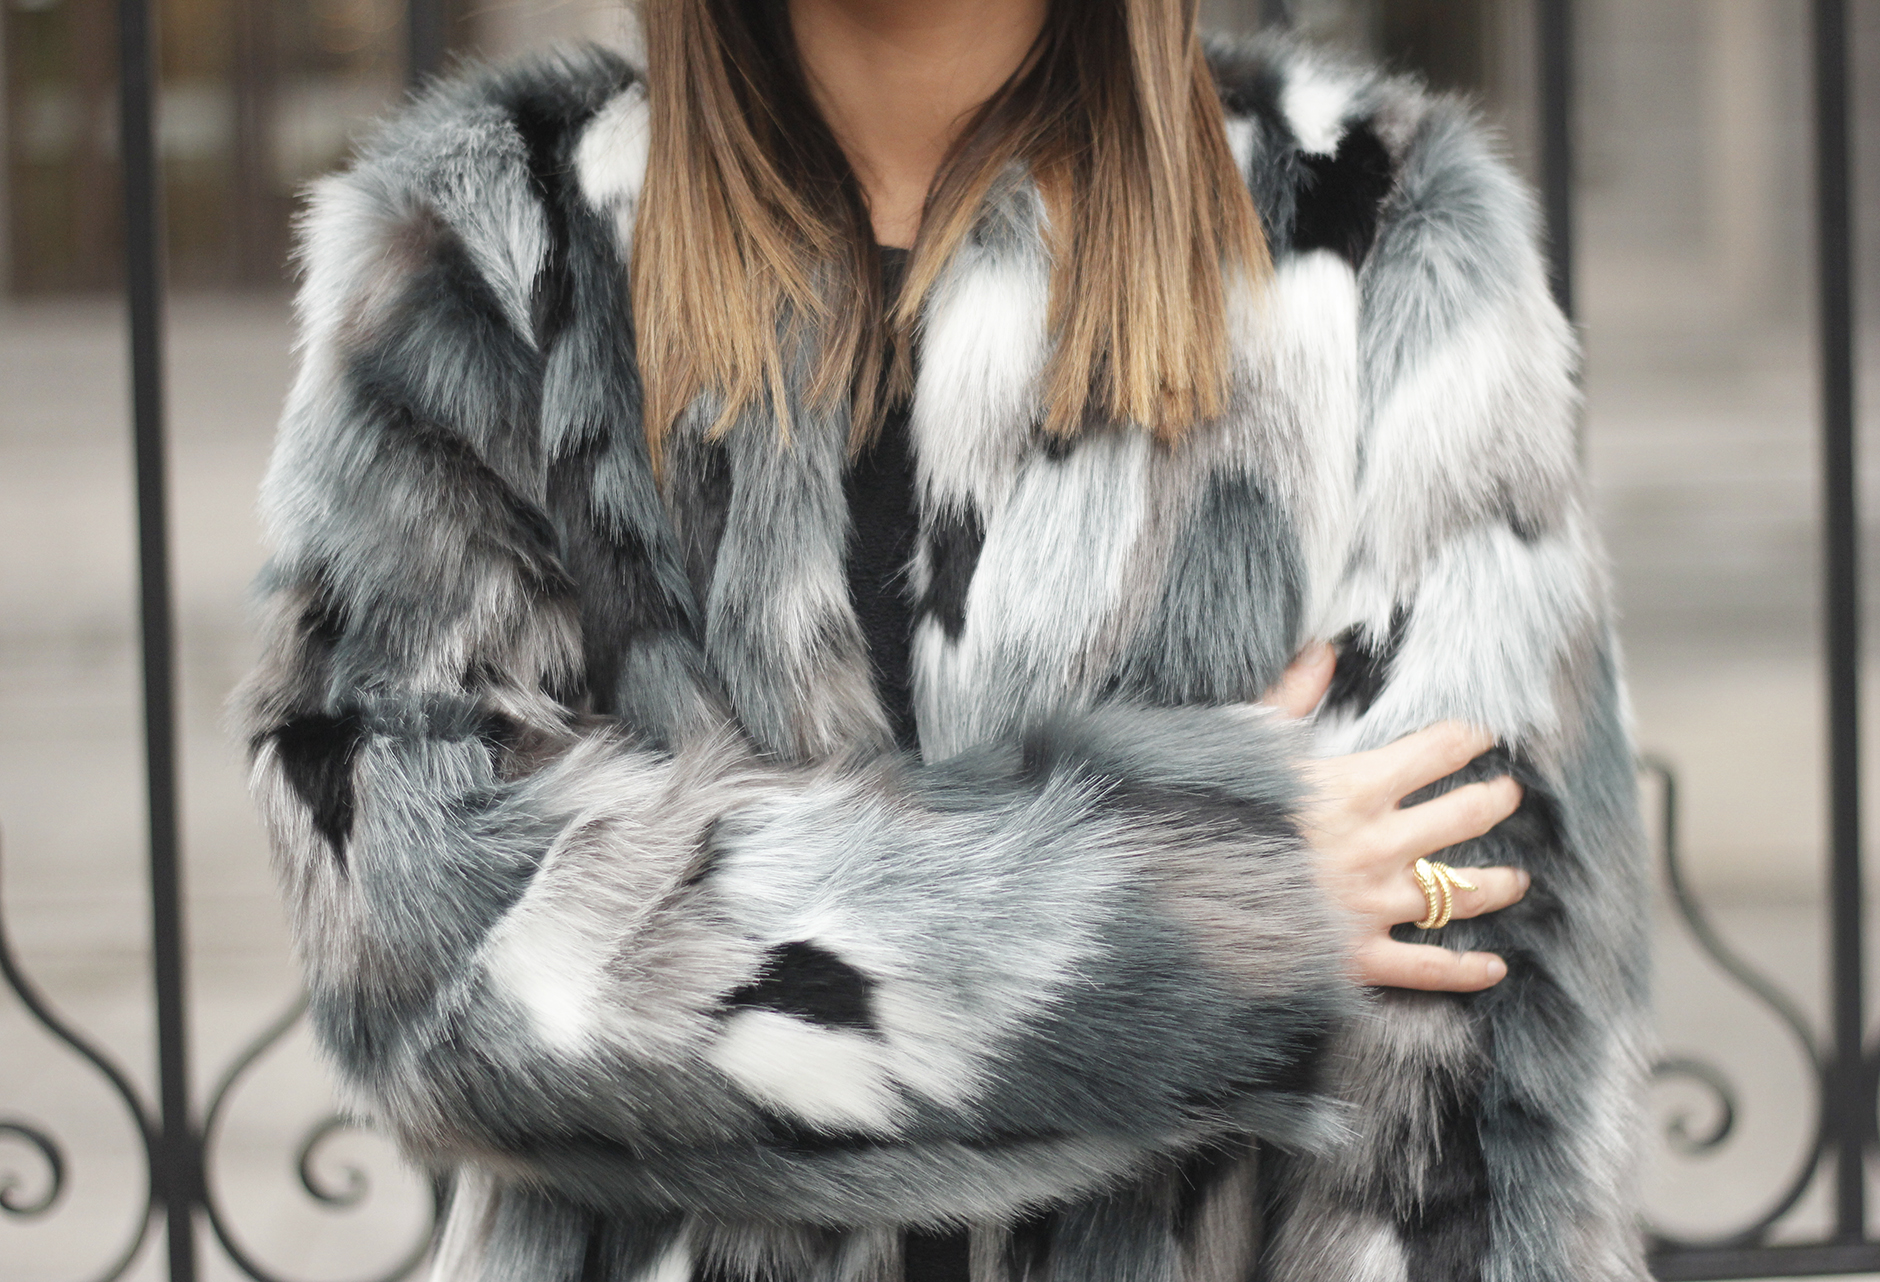 Faux fur coat leatherette pants booties black hat mango streetstyle fashion outfit18